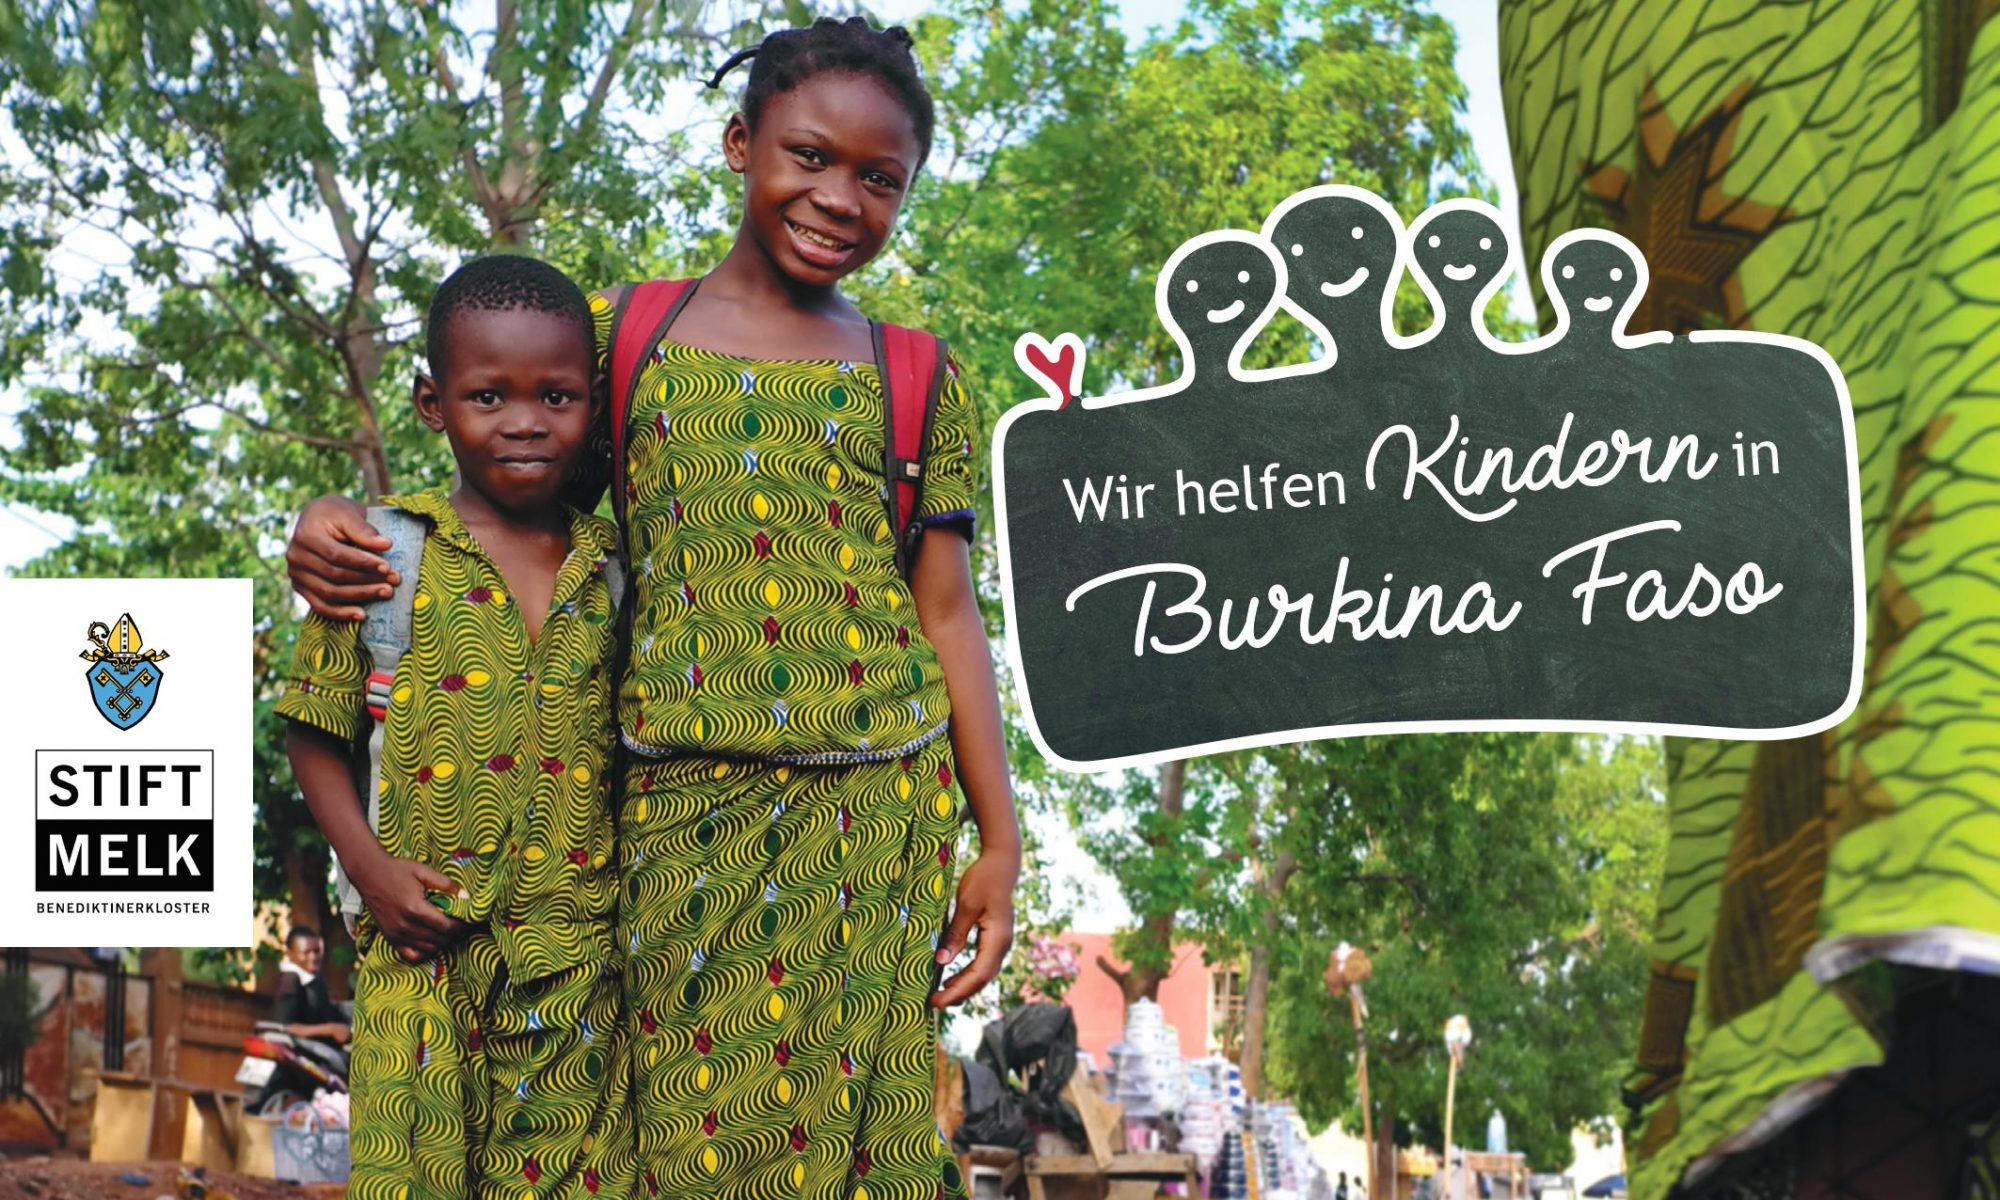 Wir helfen Kindern in Burkina Faso